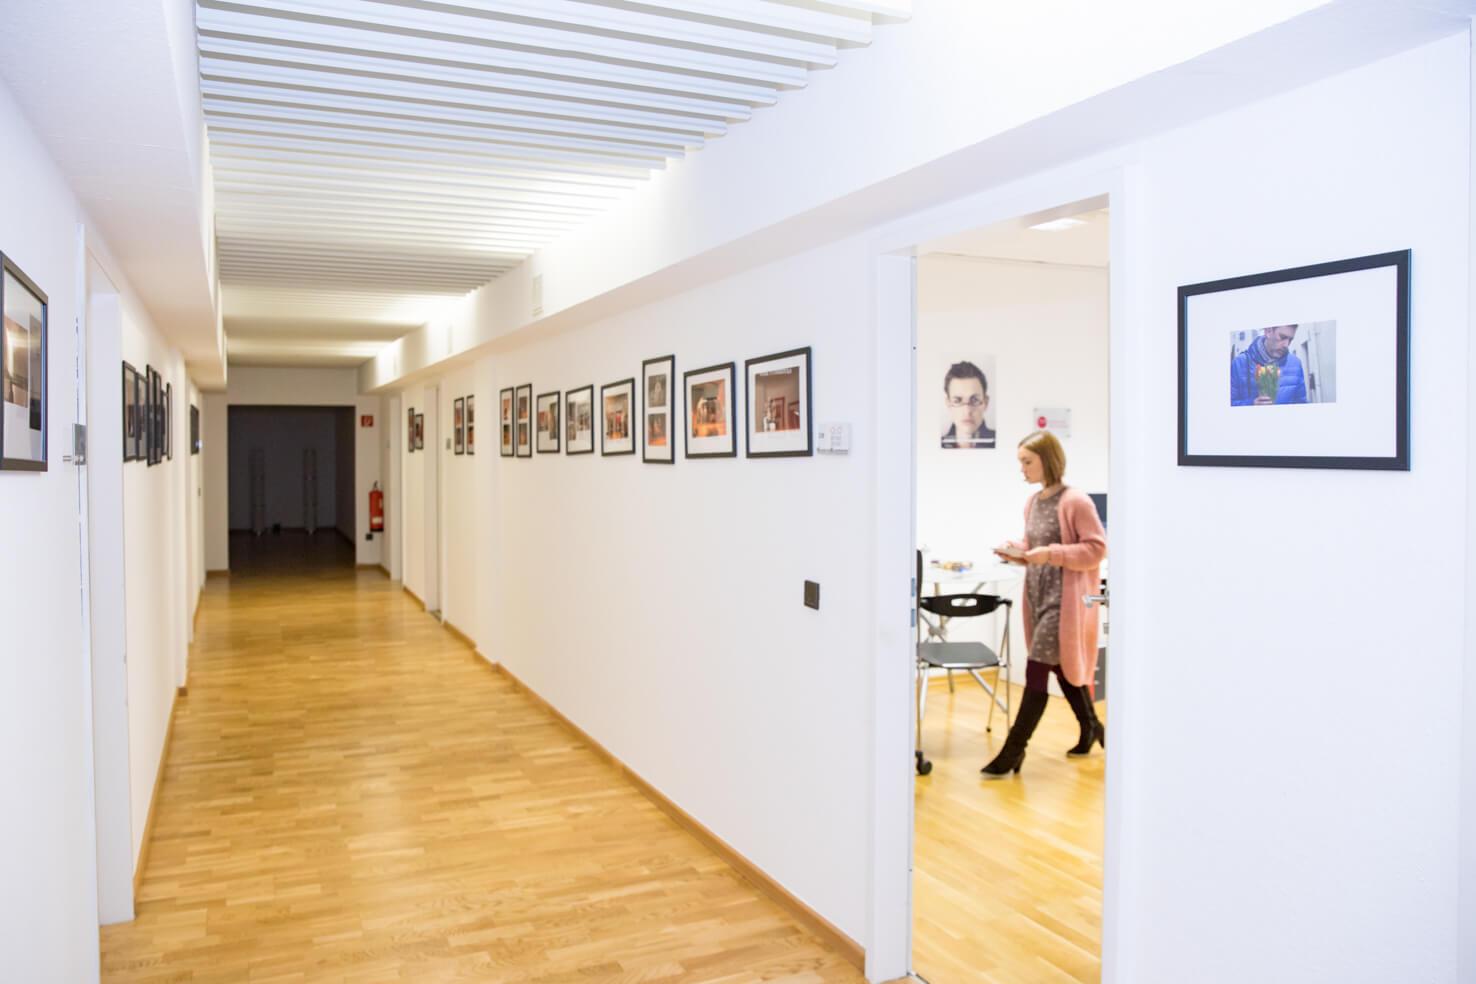 Reportage, Fotografie, BAMF, Migration, Berlin, Sozial, Soziales Projekt, Behinderung, Flüchling, Fotograf, Fotografin, Fotografie, Portrait, Porträt, Organisation, Berlin